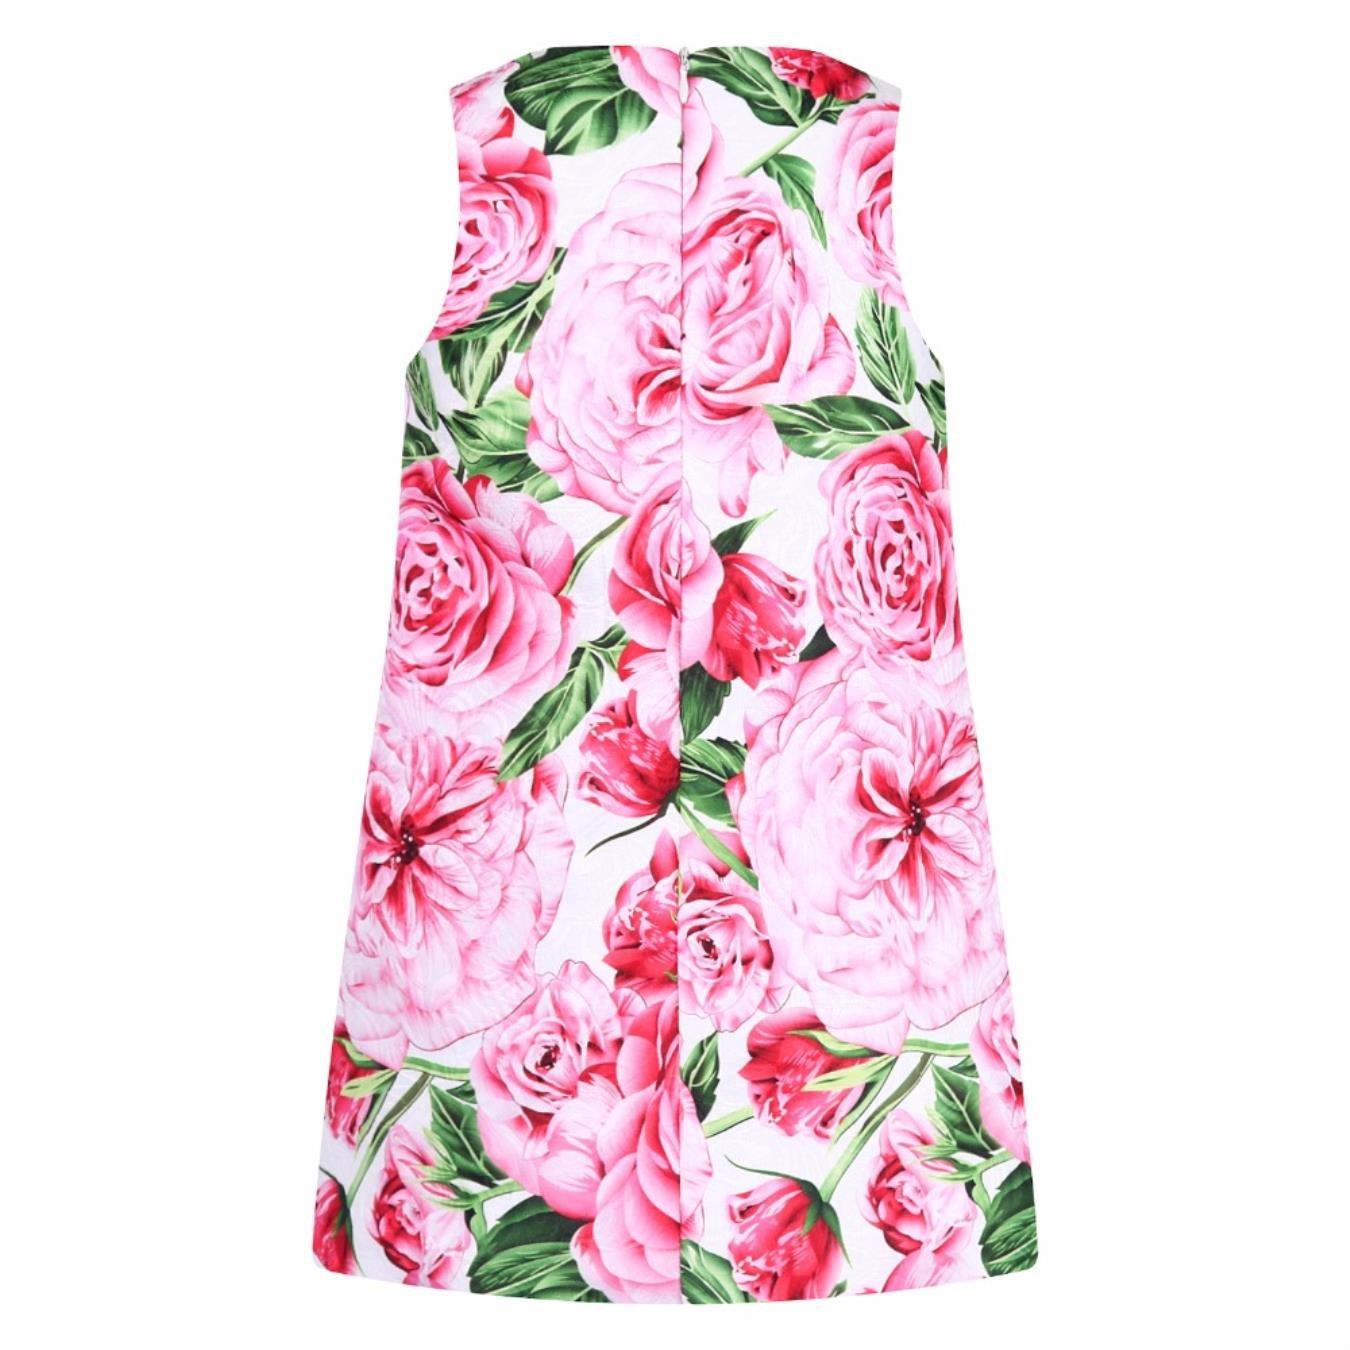 CwmCVBTJ Rose Flower Princess Dress Girls Summer Dress Children Clothing